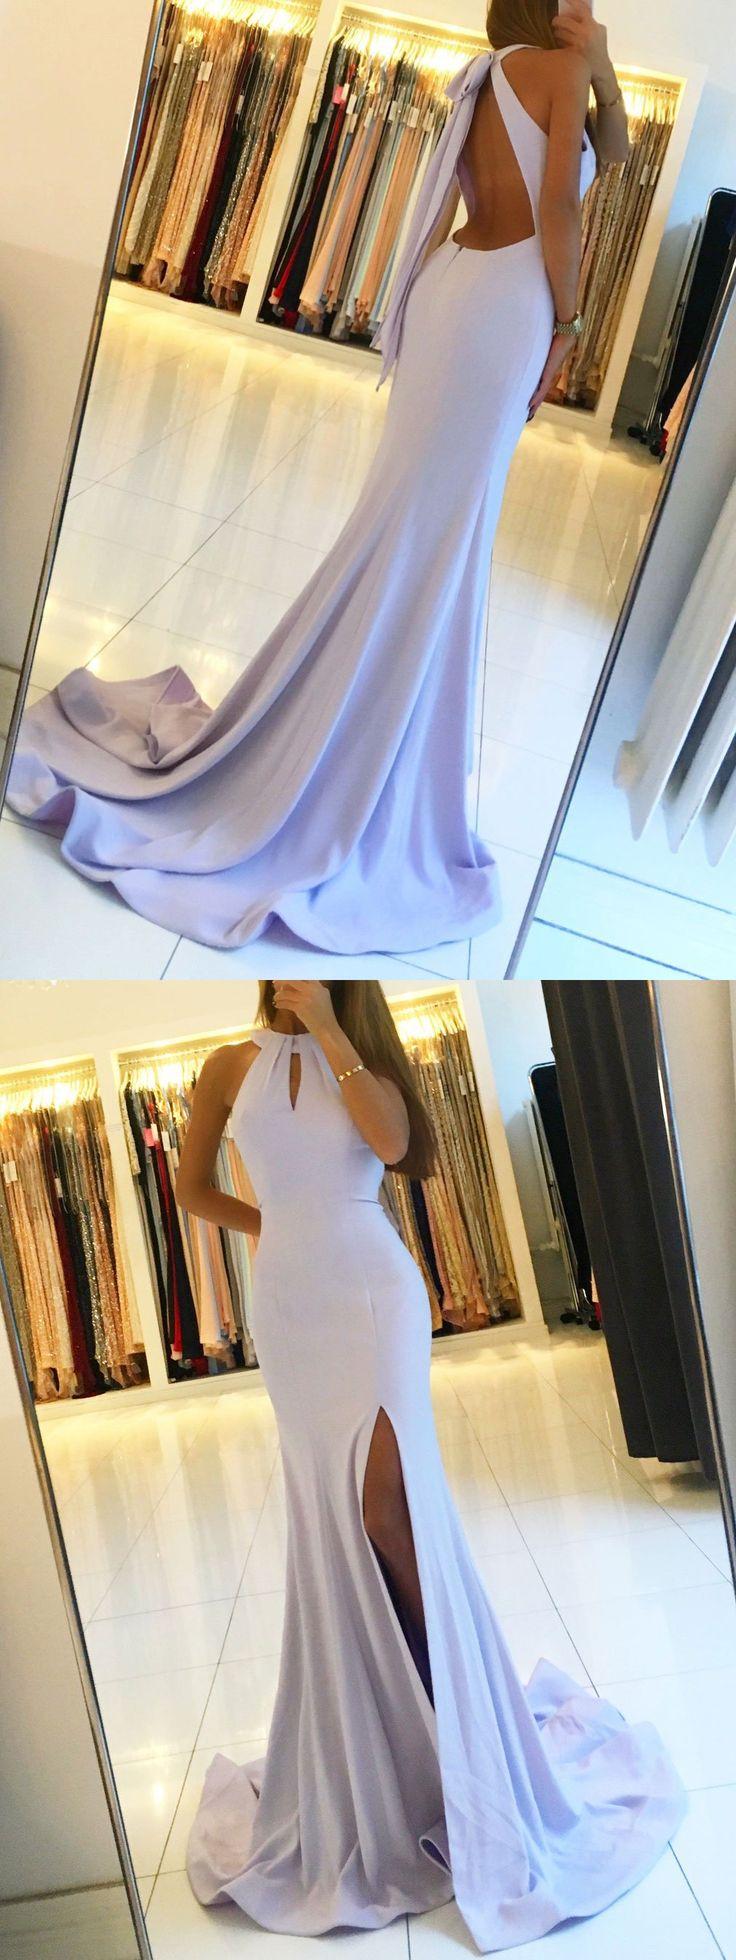 Sexy Prom Dress,High Neck Prom Dress,Mermaid Prom Dress,Long Prom Dress with Split,Lavender Evening Dress,Backless Party Dress